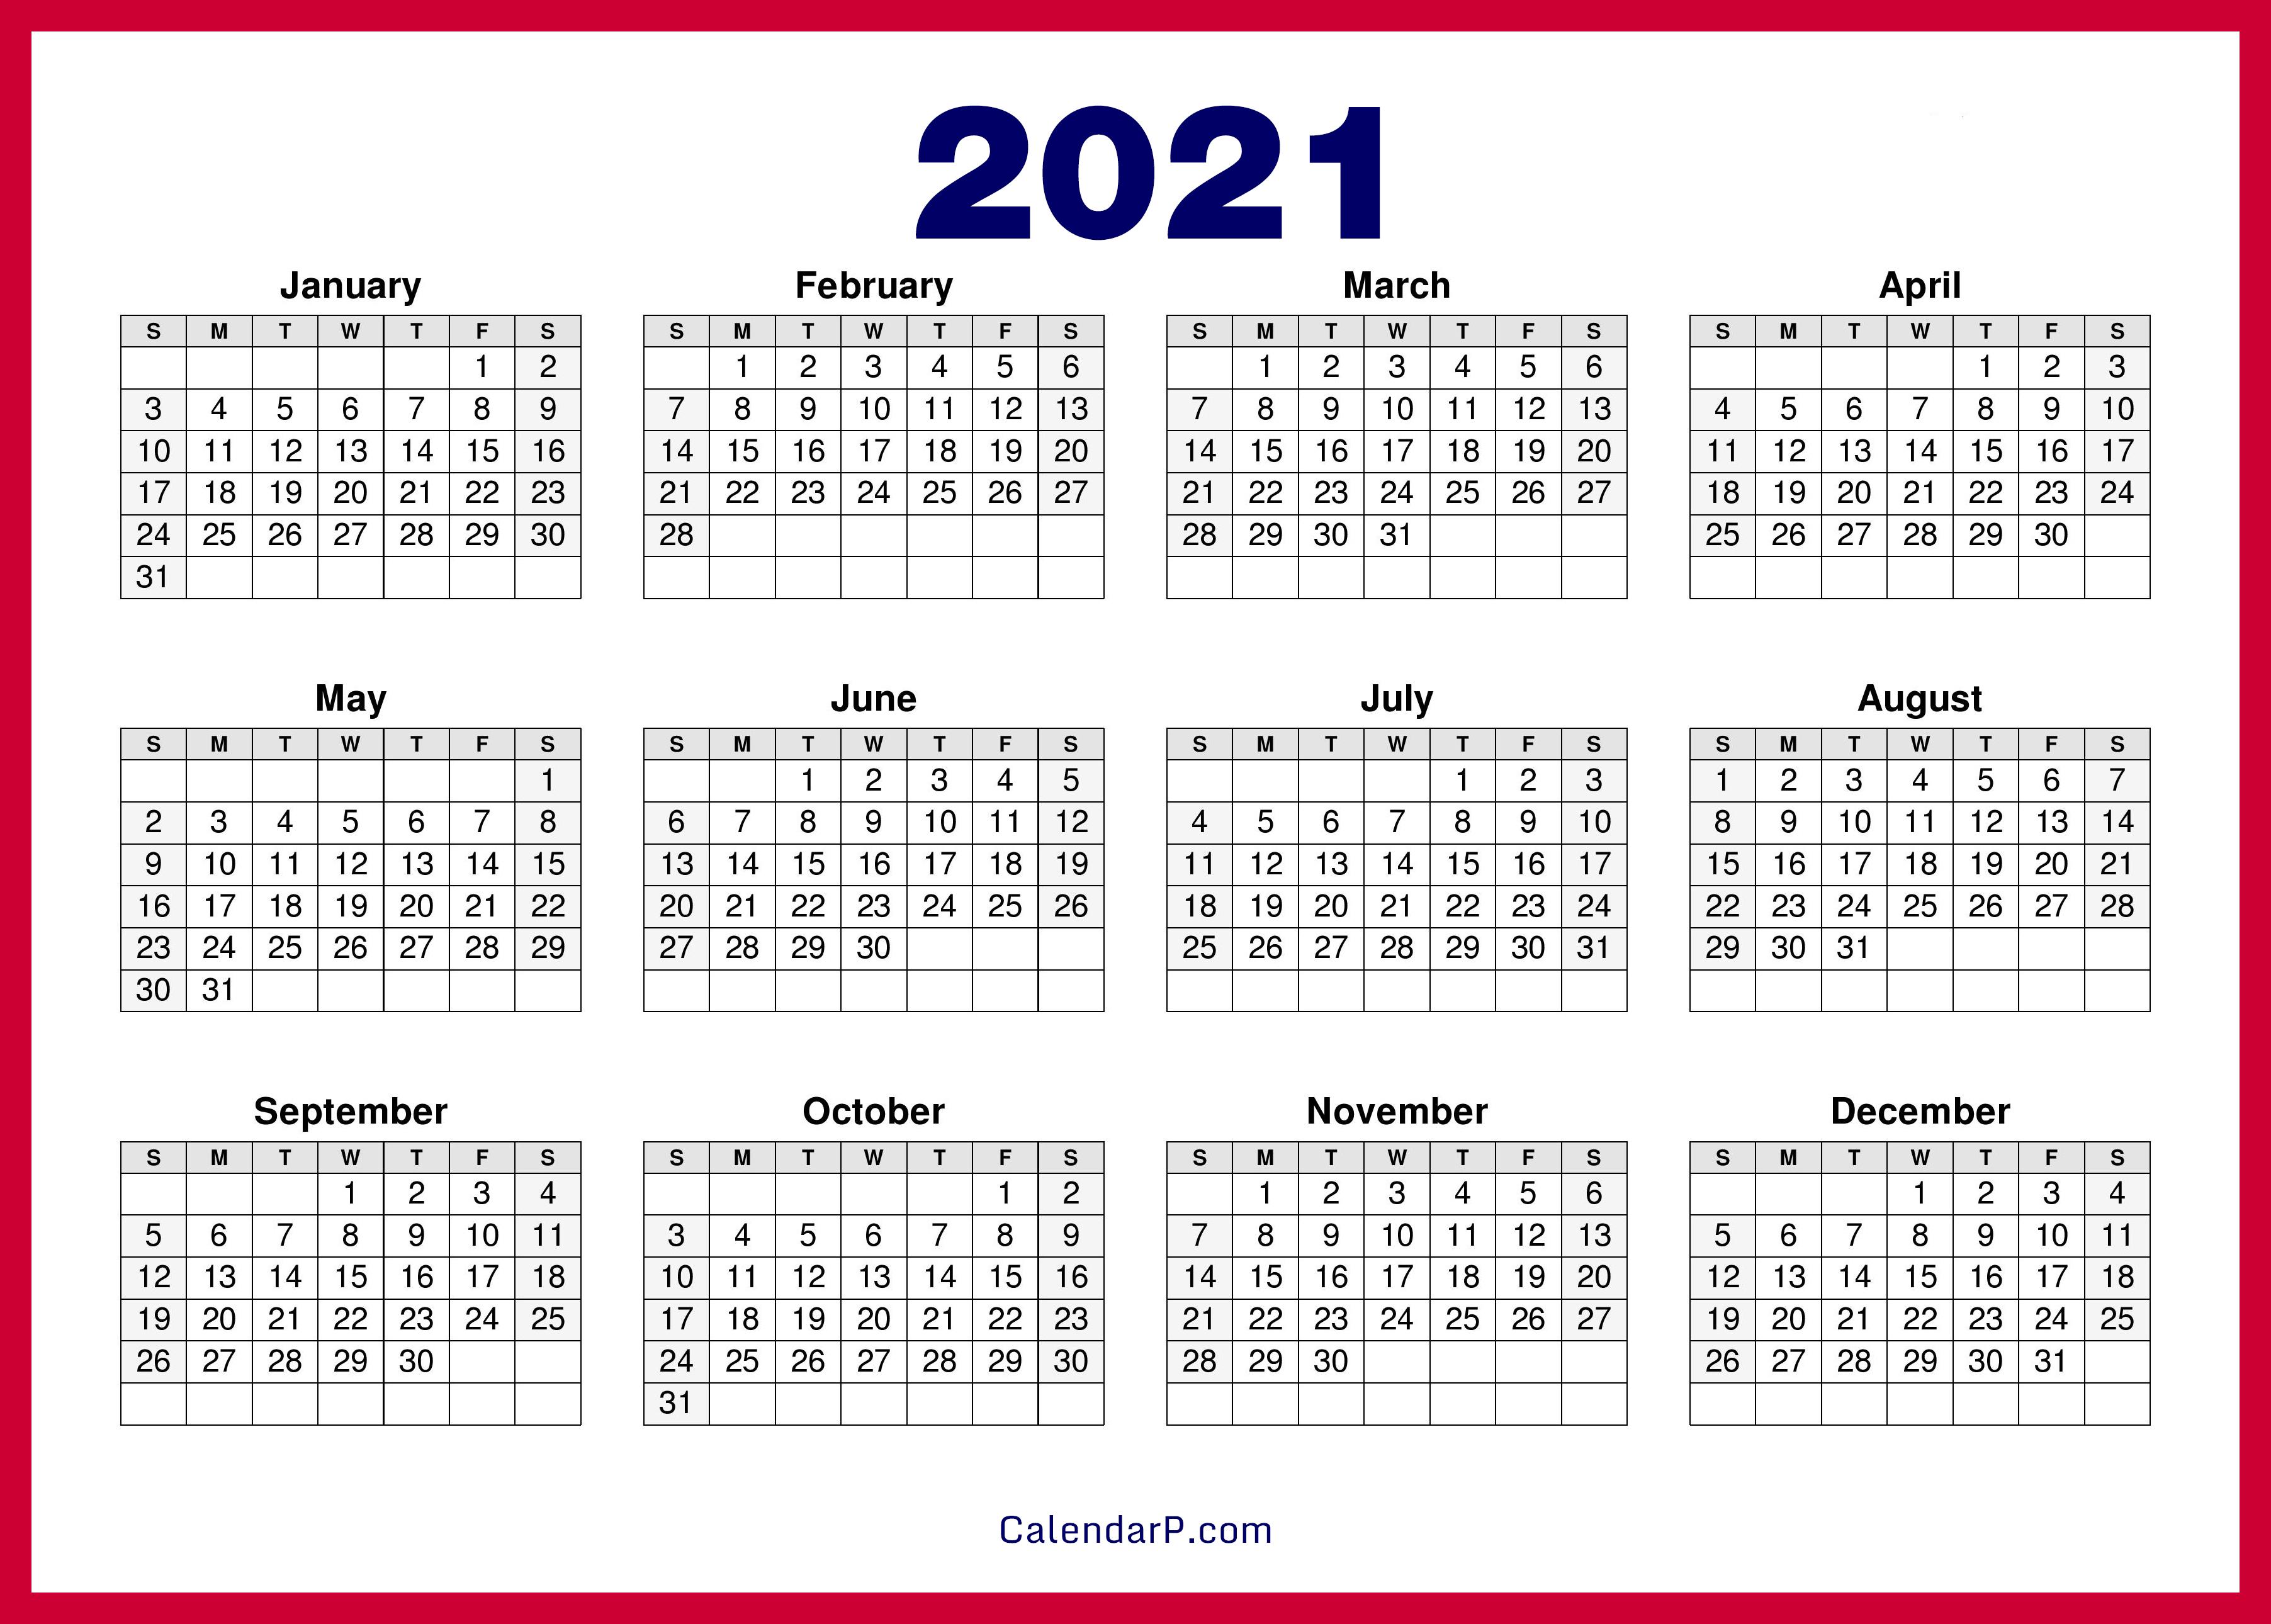 2021 Calendar Printable Free, HD - Red - CalendarP ...